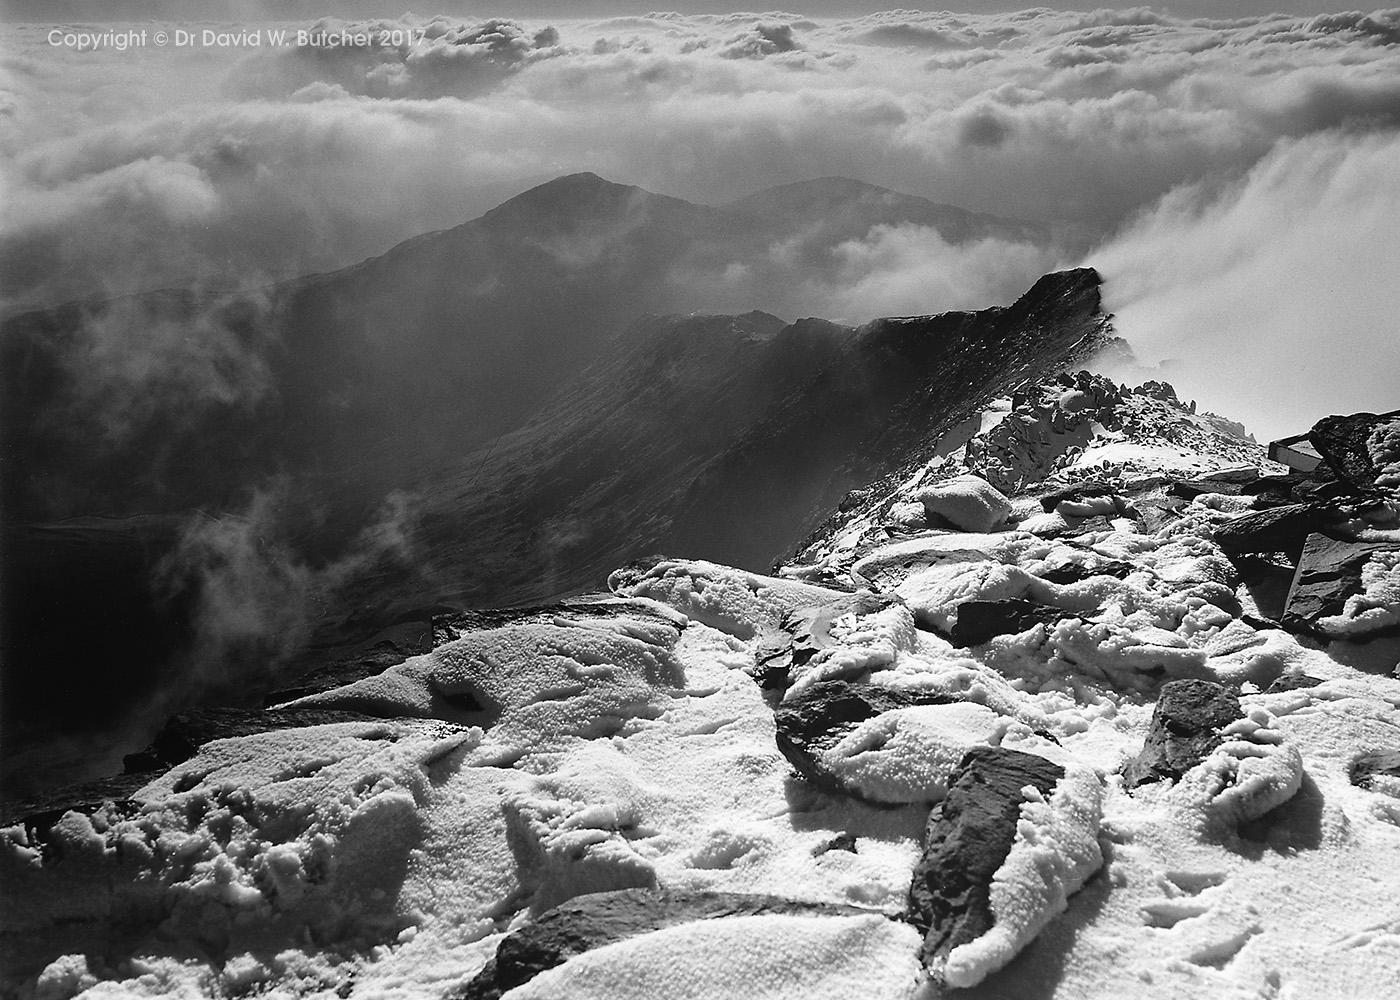 Yr Aran from Snowdon Summit, Snowdonia, Wales